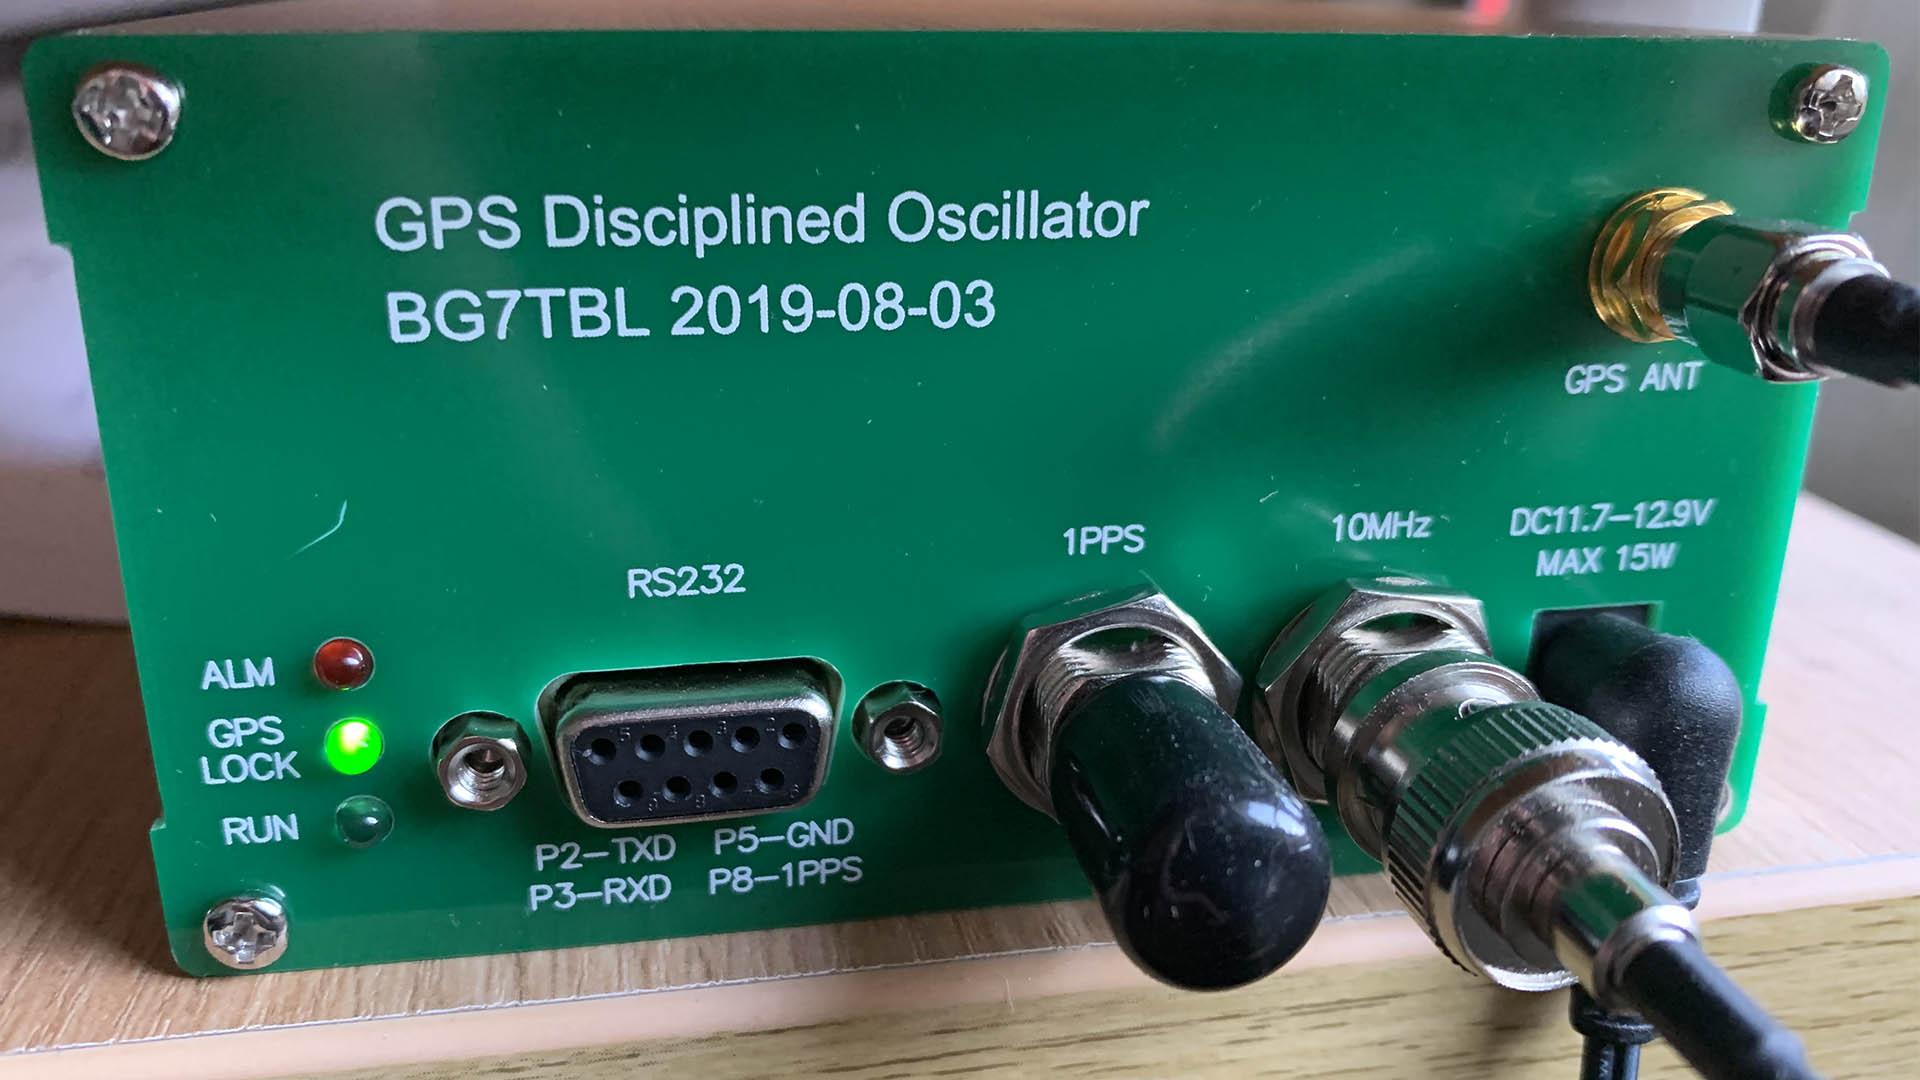 Picture of BG7TBL 10MHz GPS Oscillator